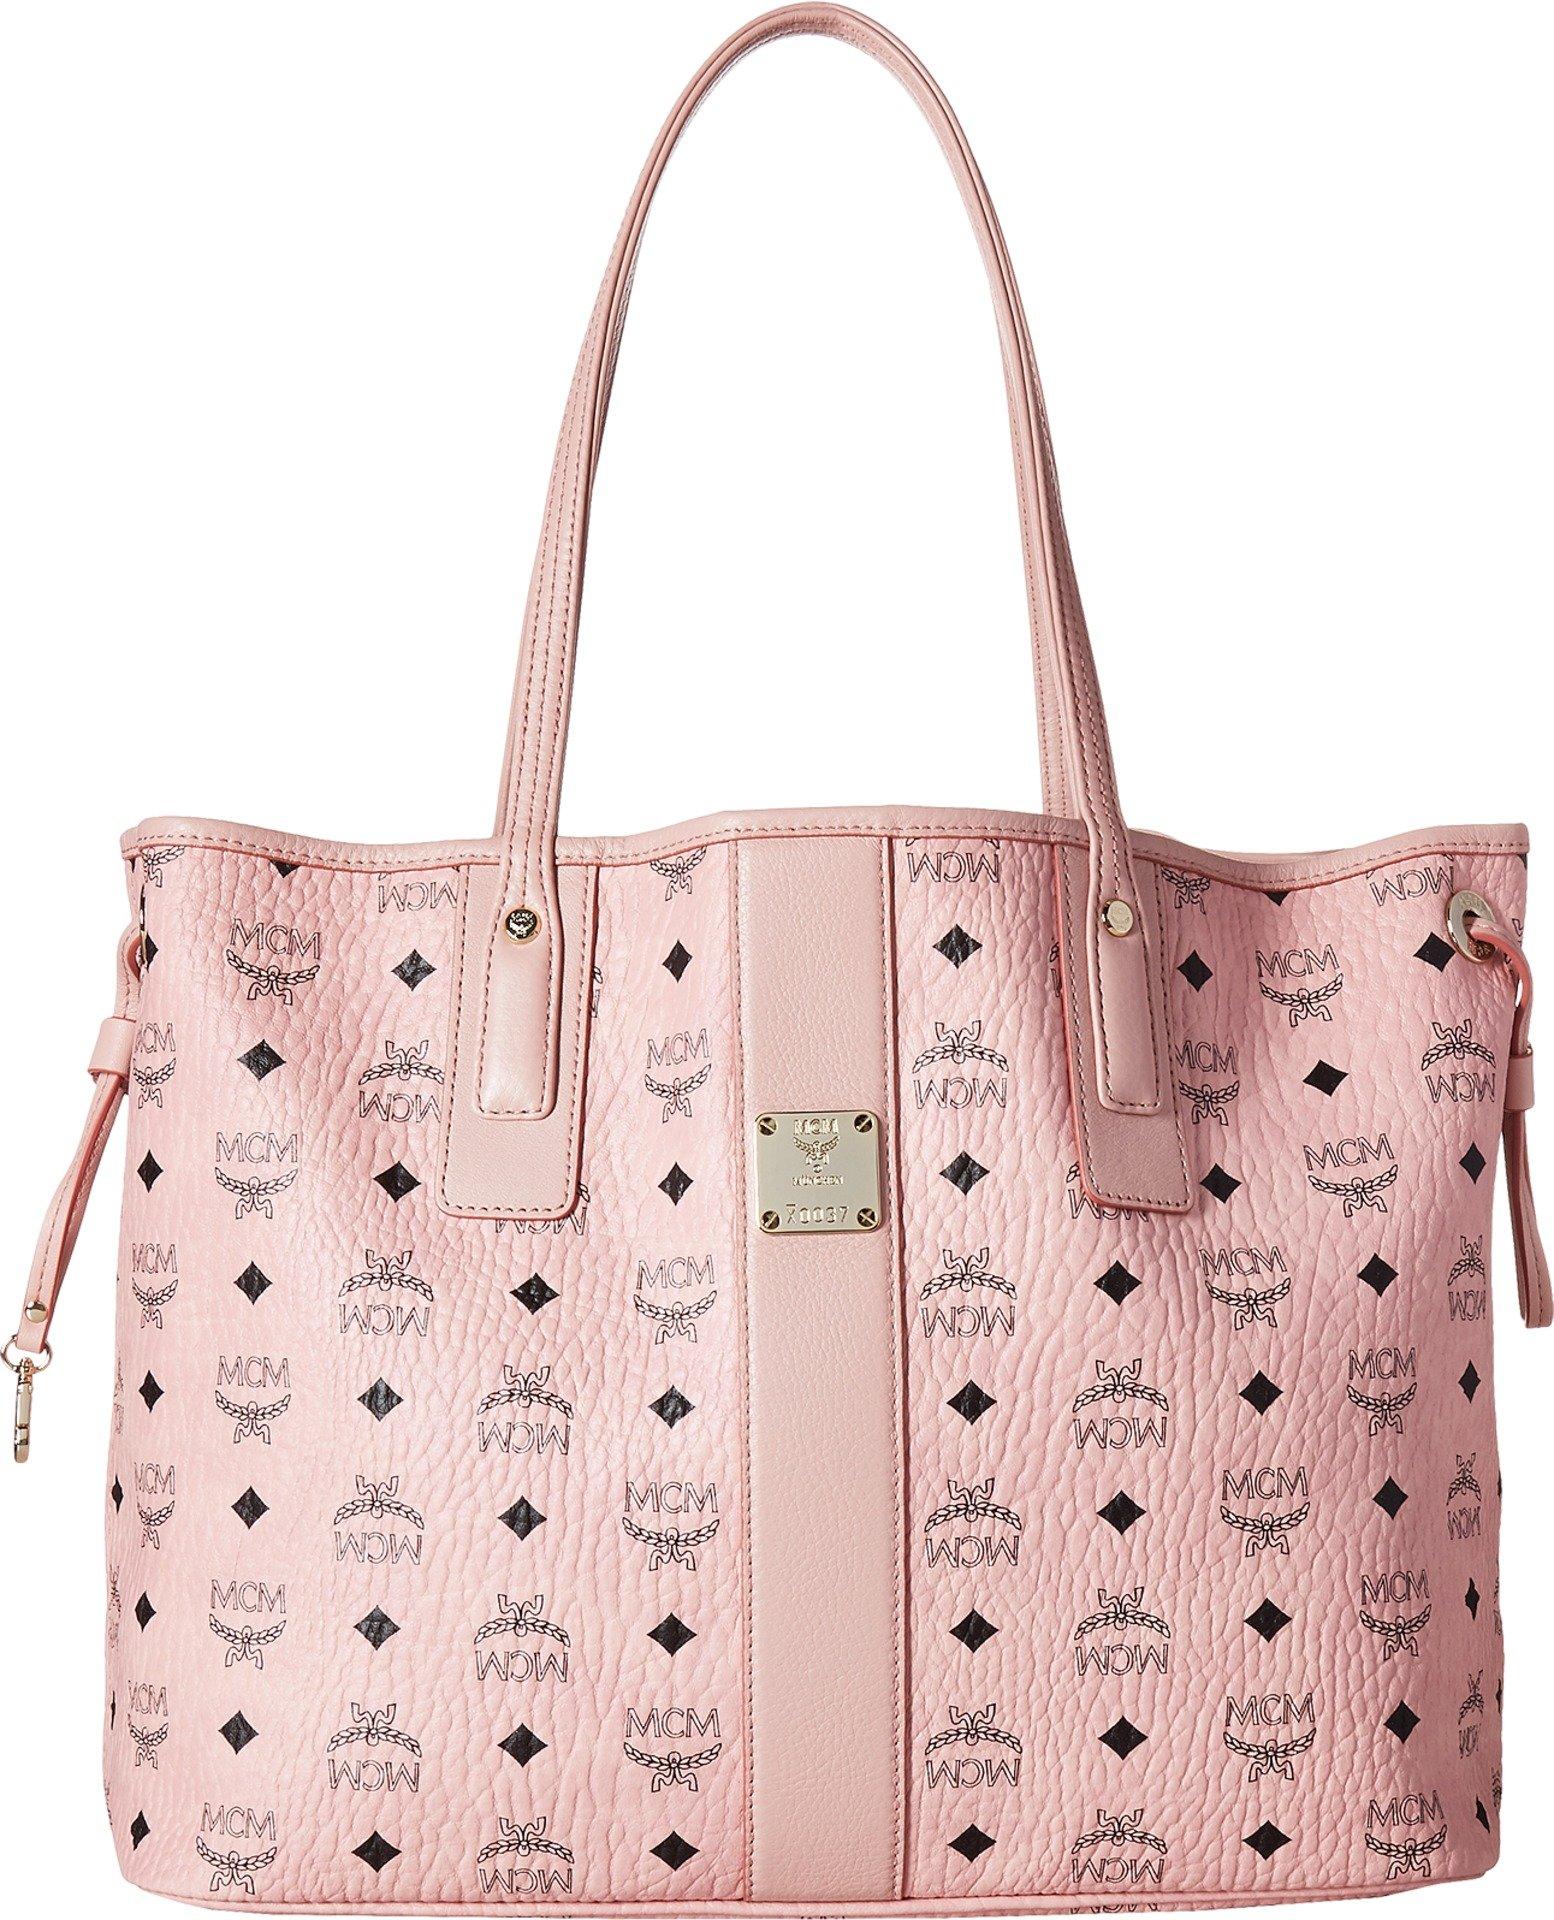 MCM Women's Liz Shopper Tote, Soft Pink, One Size